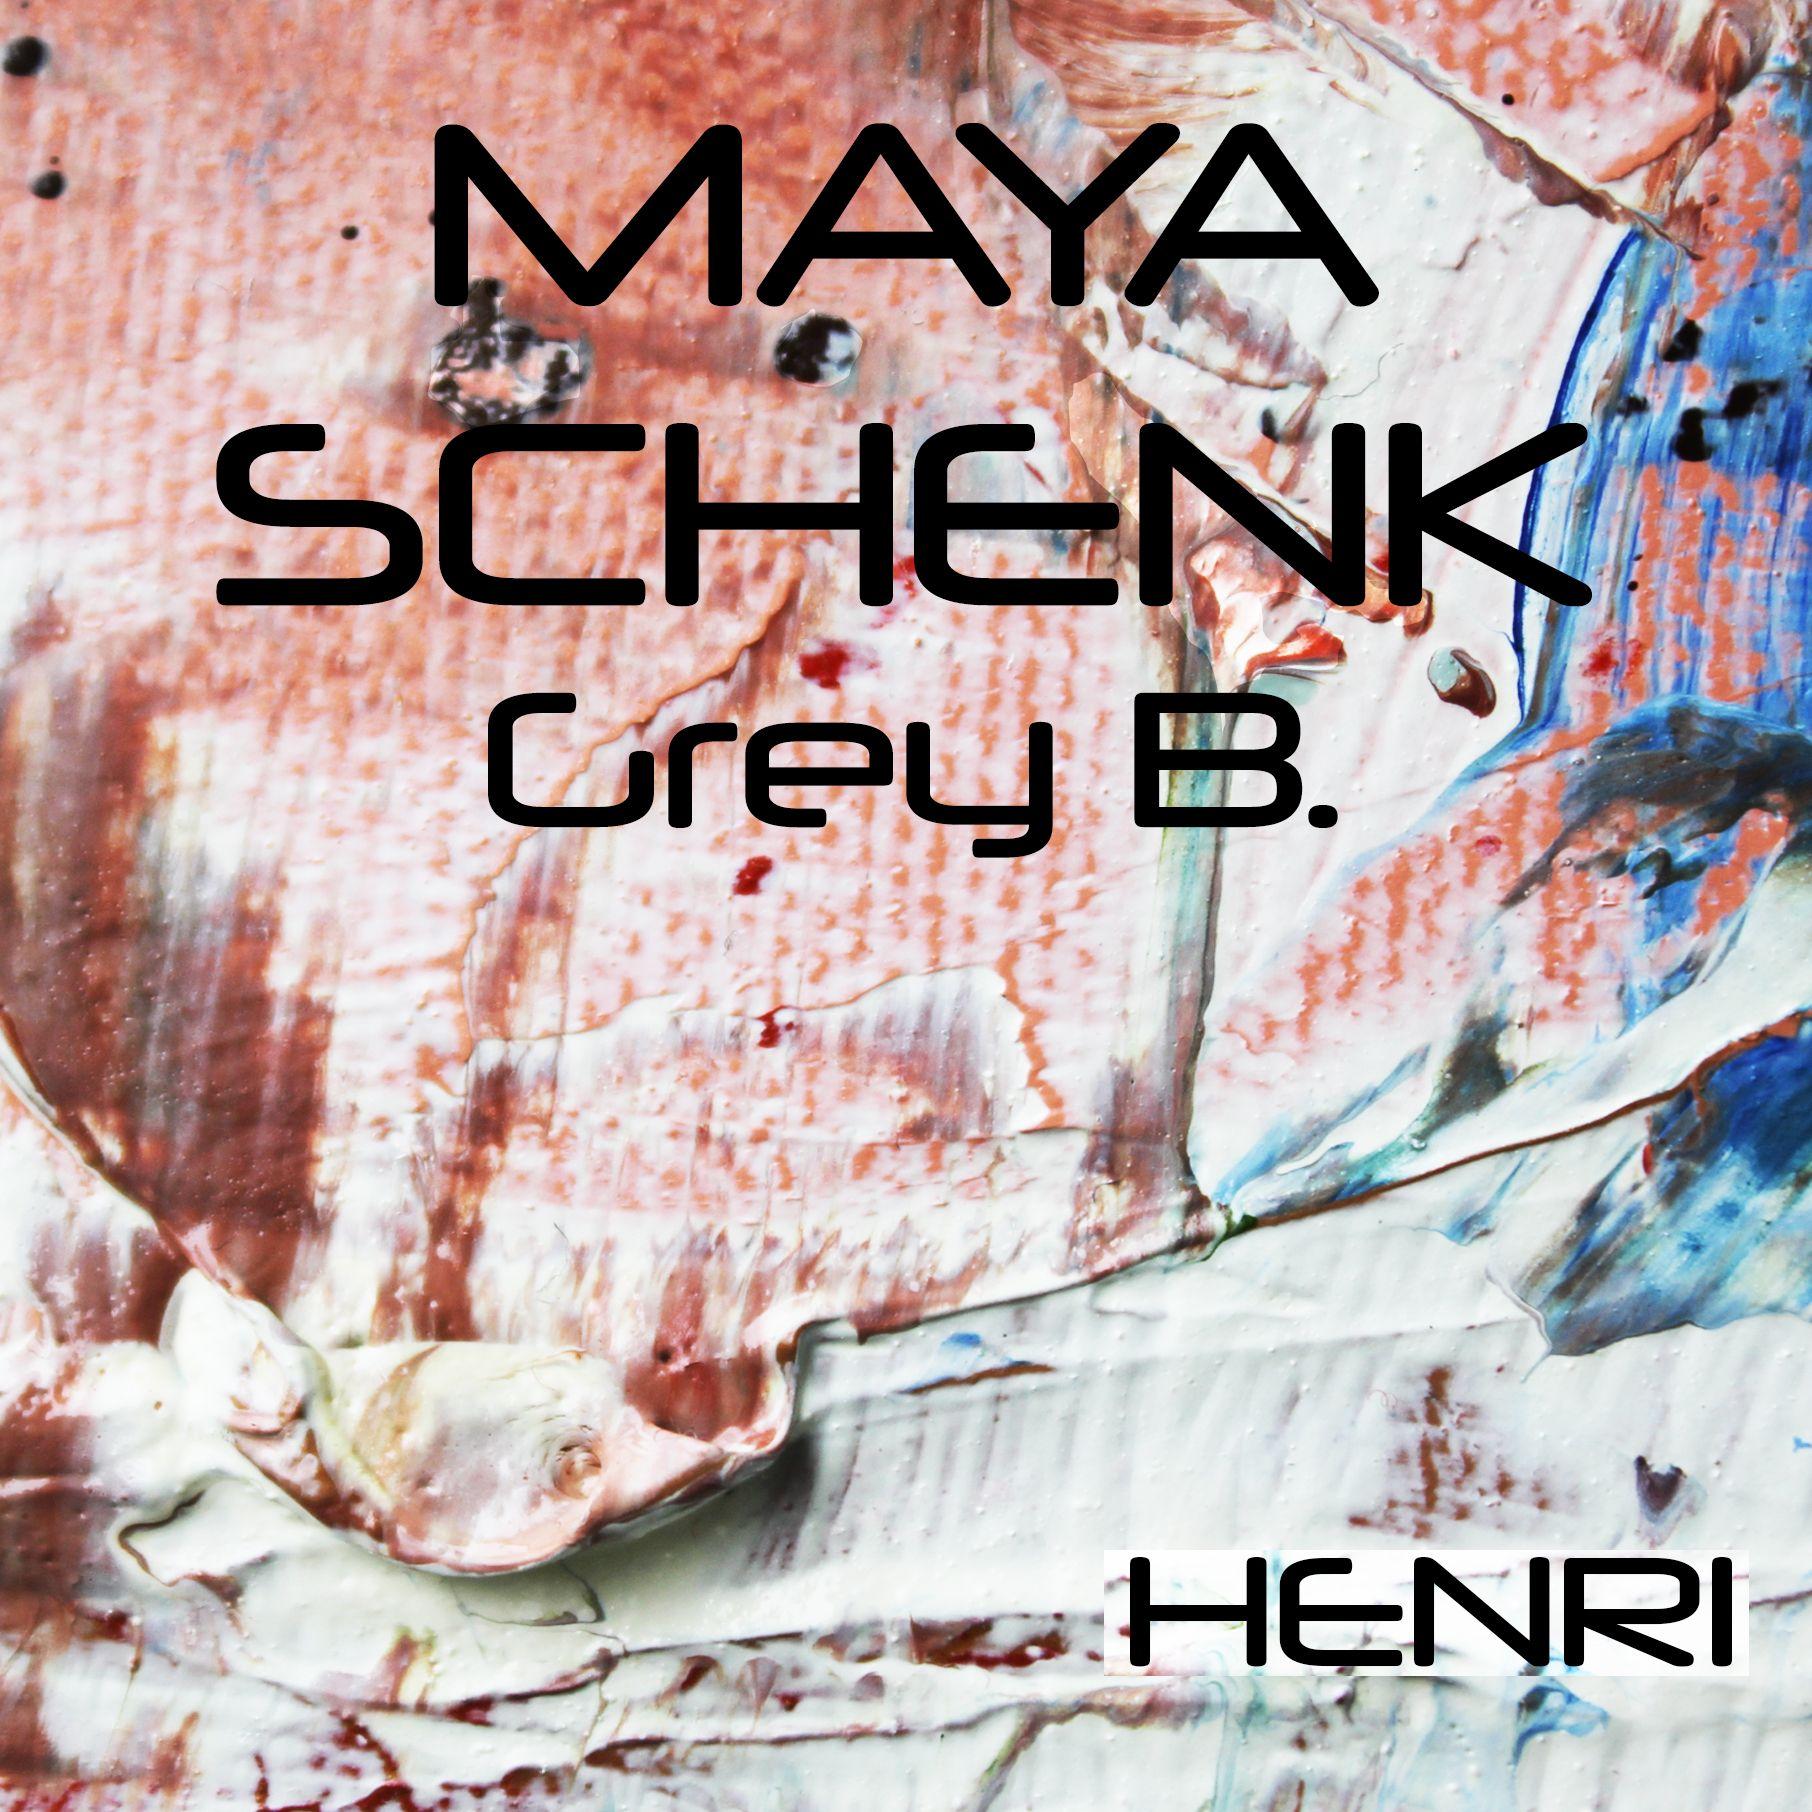 grey_b._ep_cover.jpg